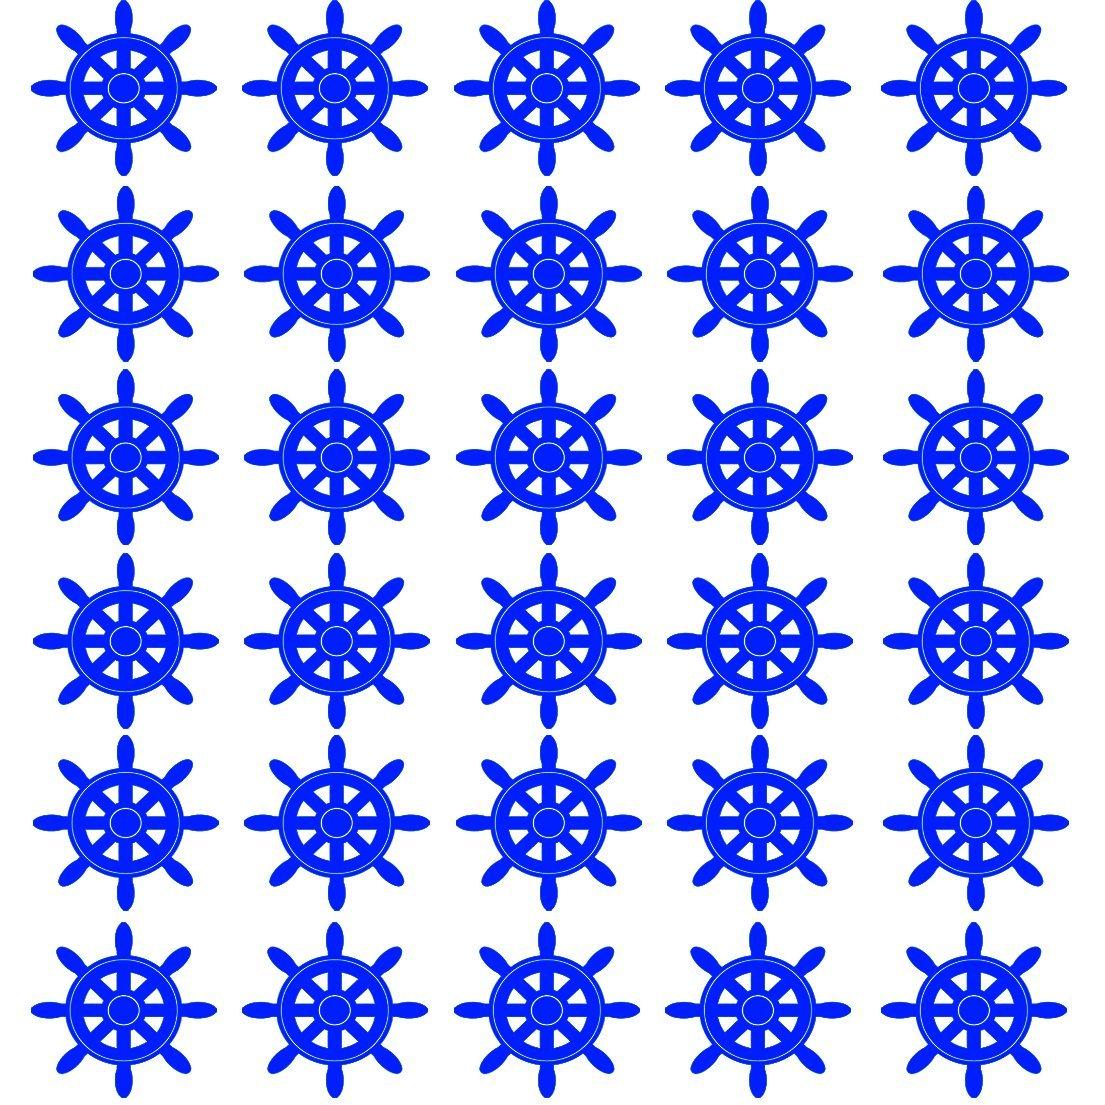 VWAQ Sailor Ship Wheel Wall Sticker - Nautical Wheel Wall Decals - 30 Pack VWAQ (Sky Blue)